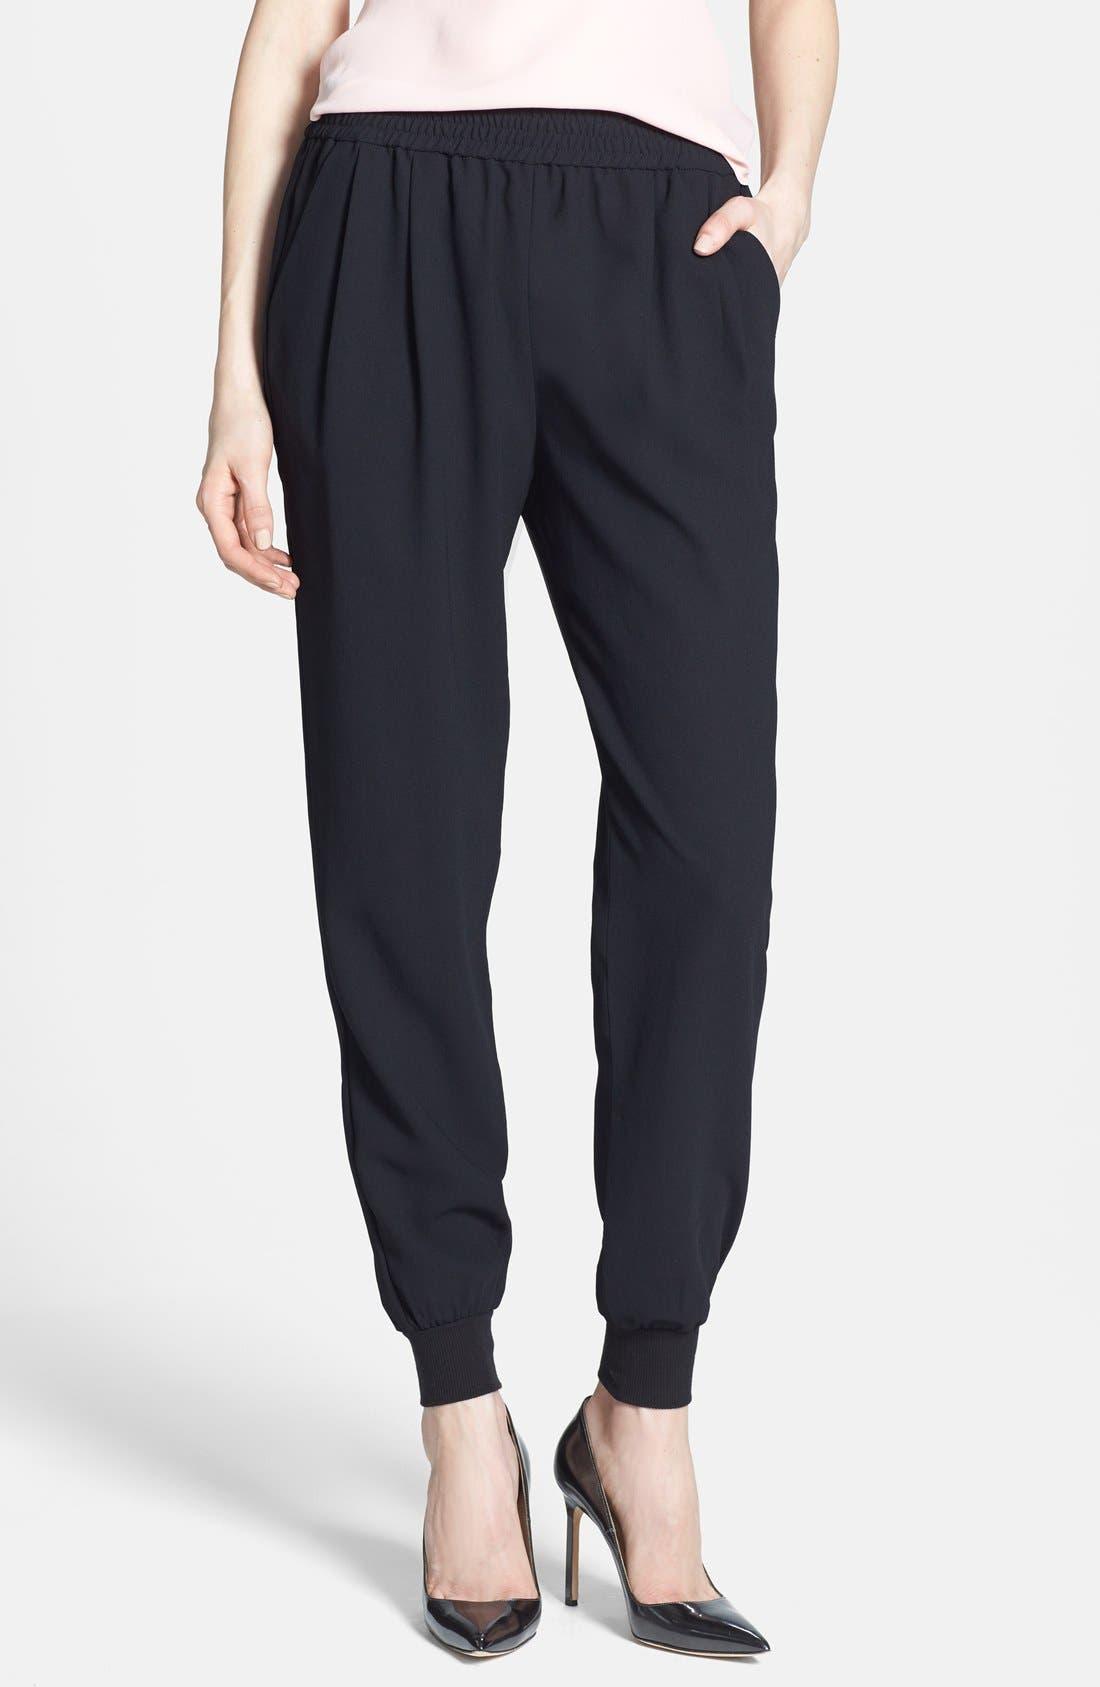 JOIE 'Mariner B.' Track Pants, Main, color, CAVIAR